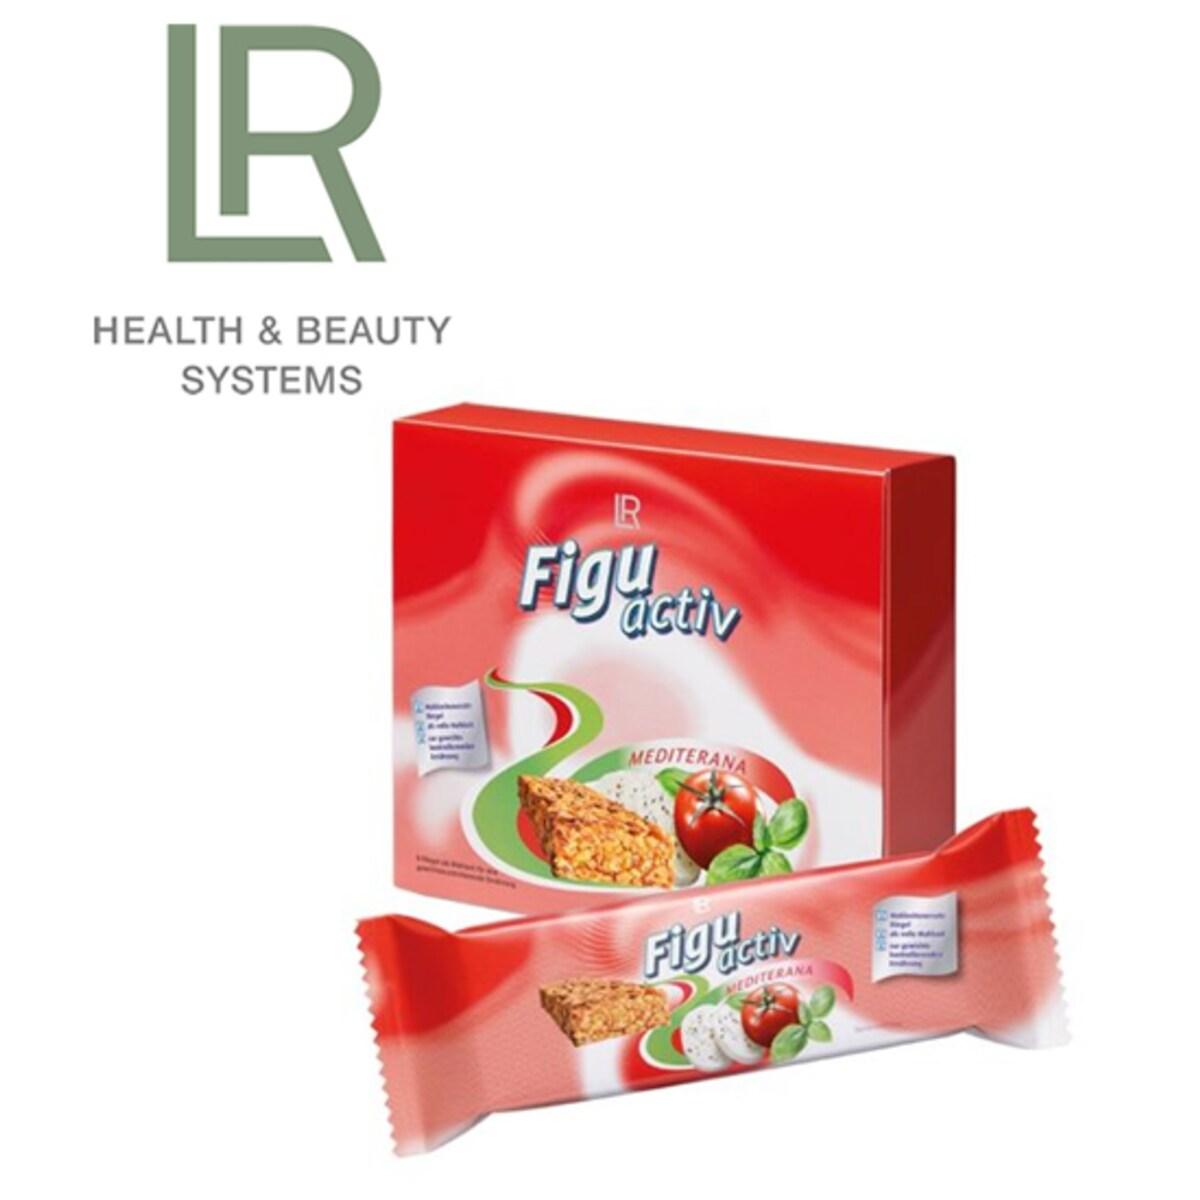 LR Figuactiv Mediterana блокчета с вкус на домат, моцарела и босилек 6 броя по 60 гр